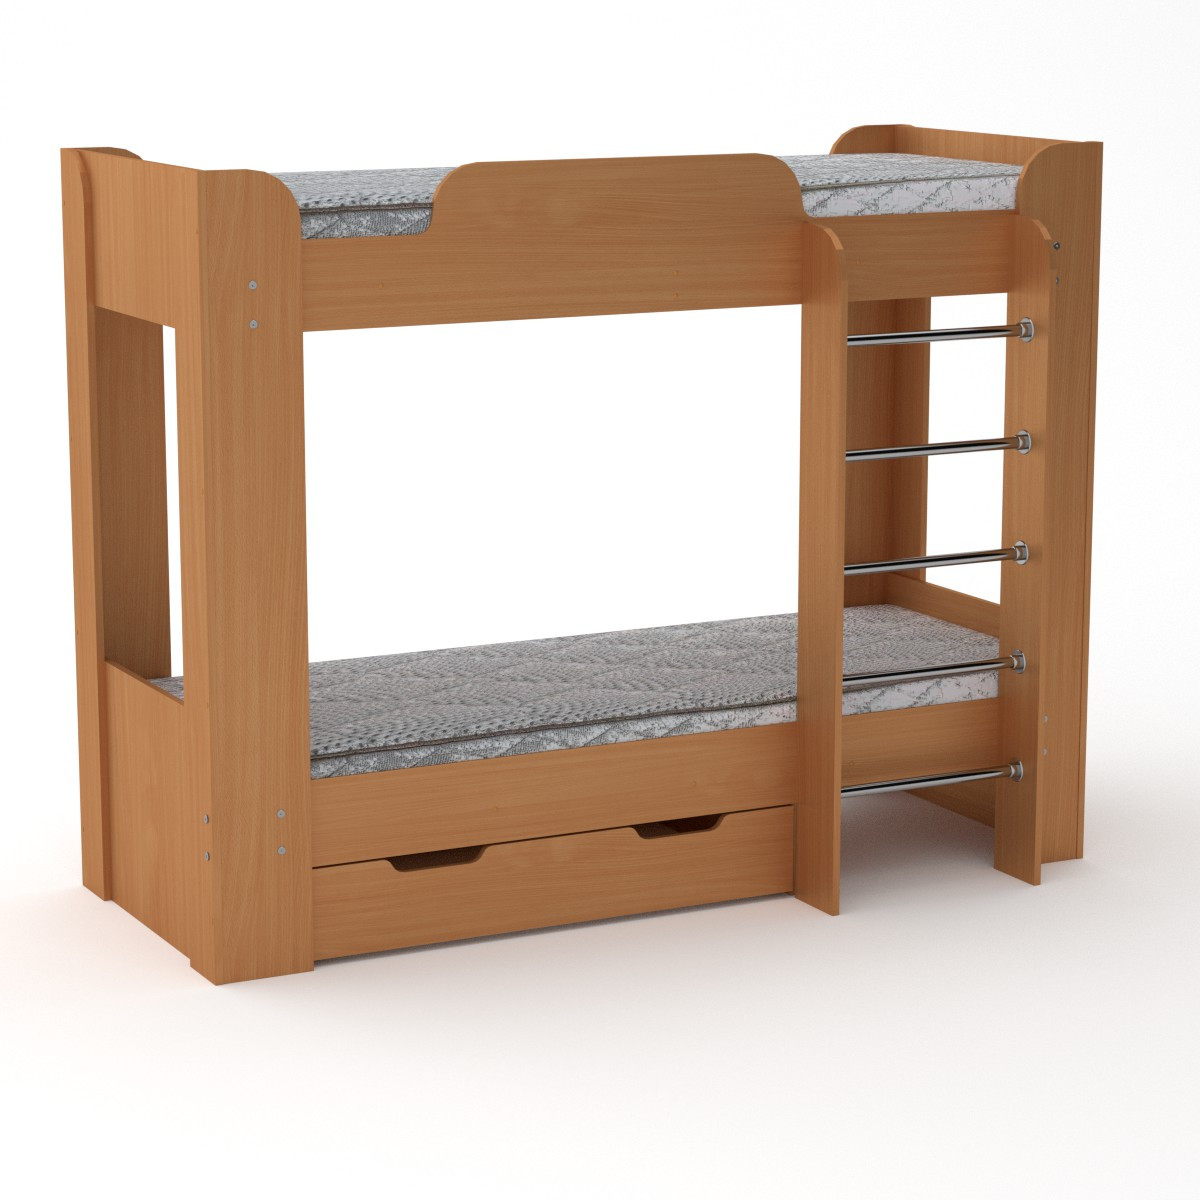 Двухъярусная кровать Твикс-2 Компанит 1974х1522х908 мм дсп